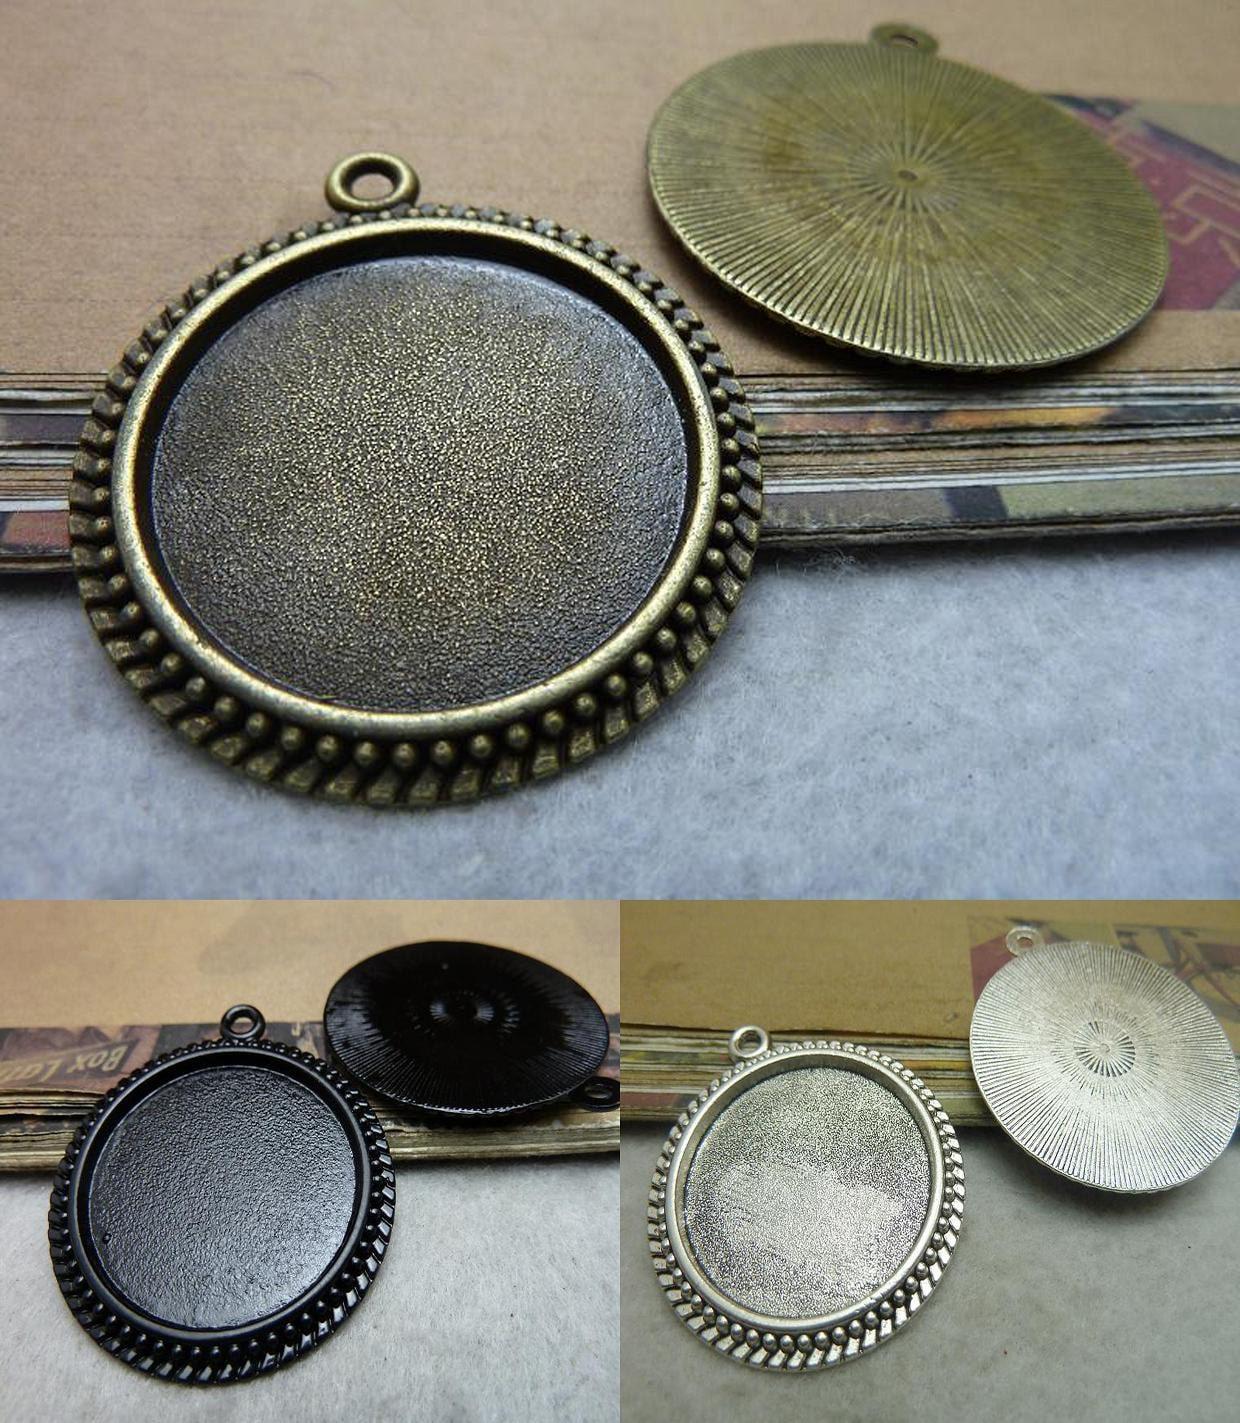 6 Antik Bronze schwarz Antik Silber Cabochon Basis rund 30mm Lünette ...